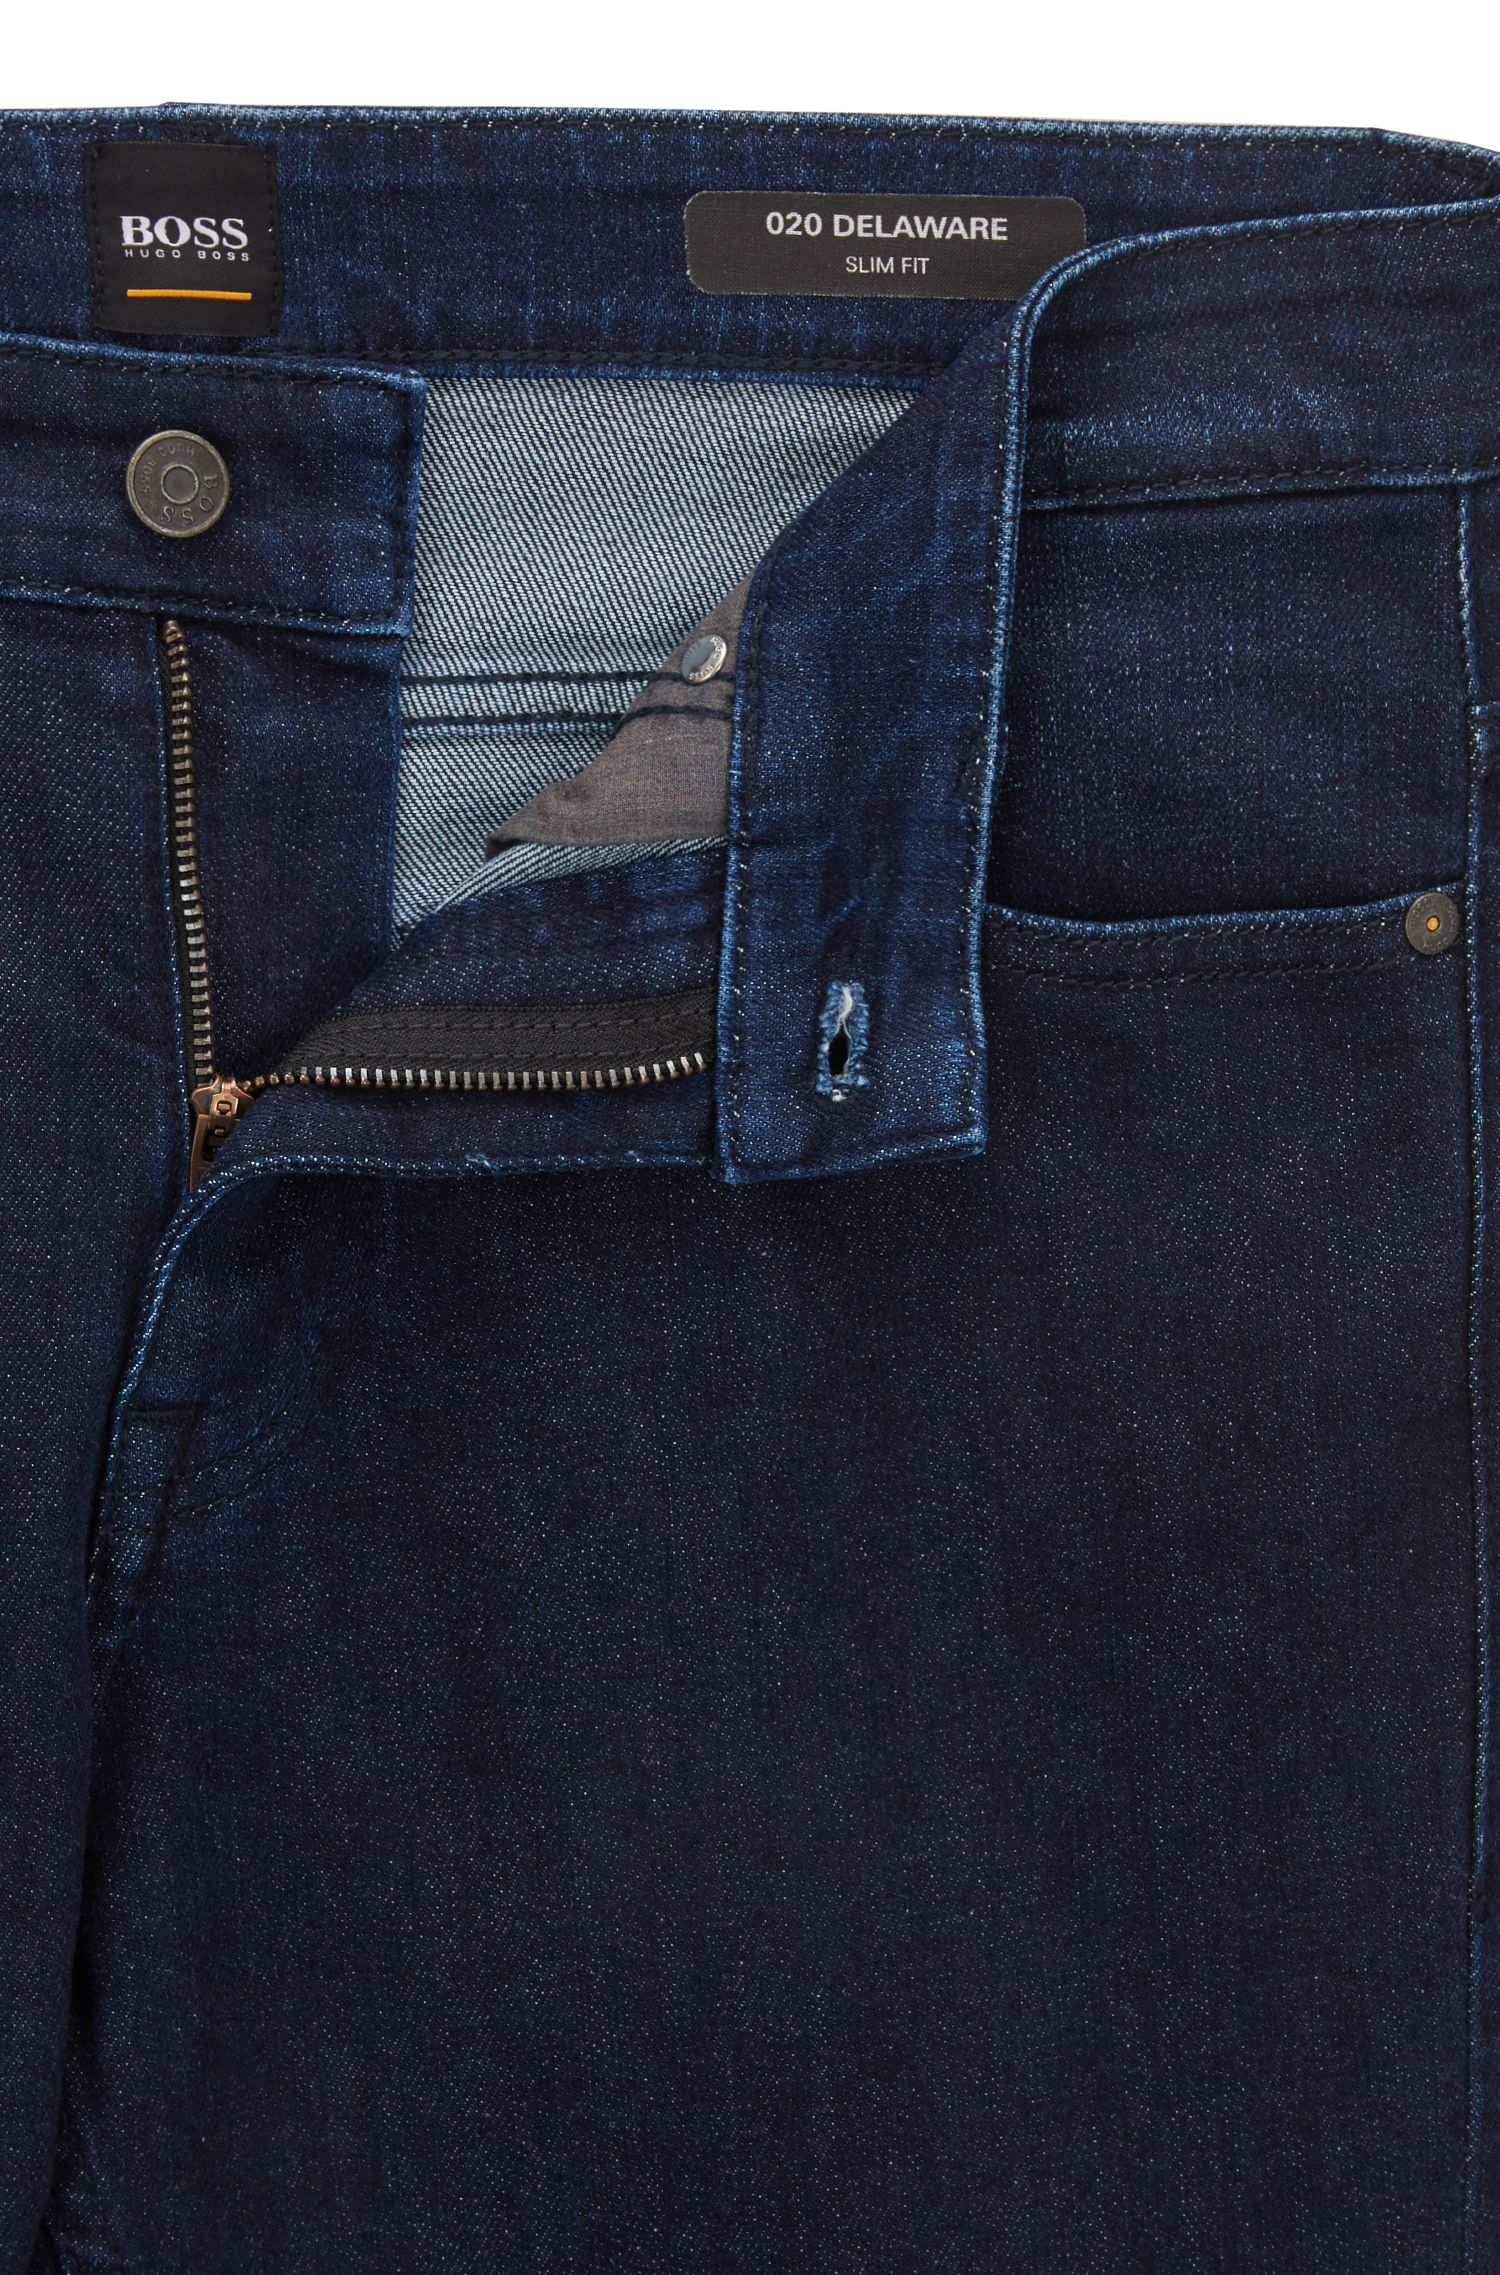 Slim-fit jeans in washed indigo stretch denim